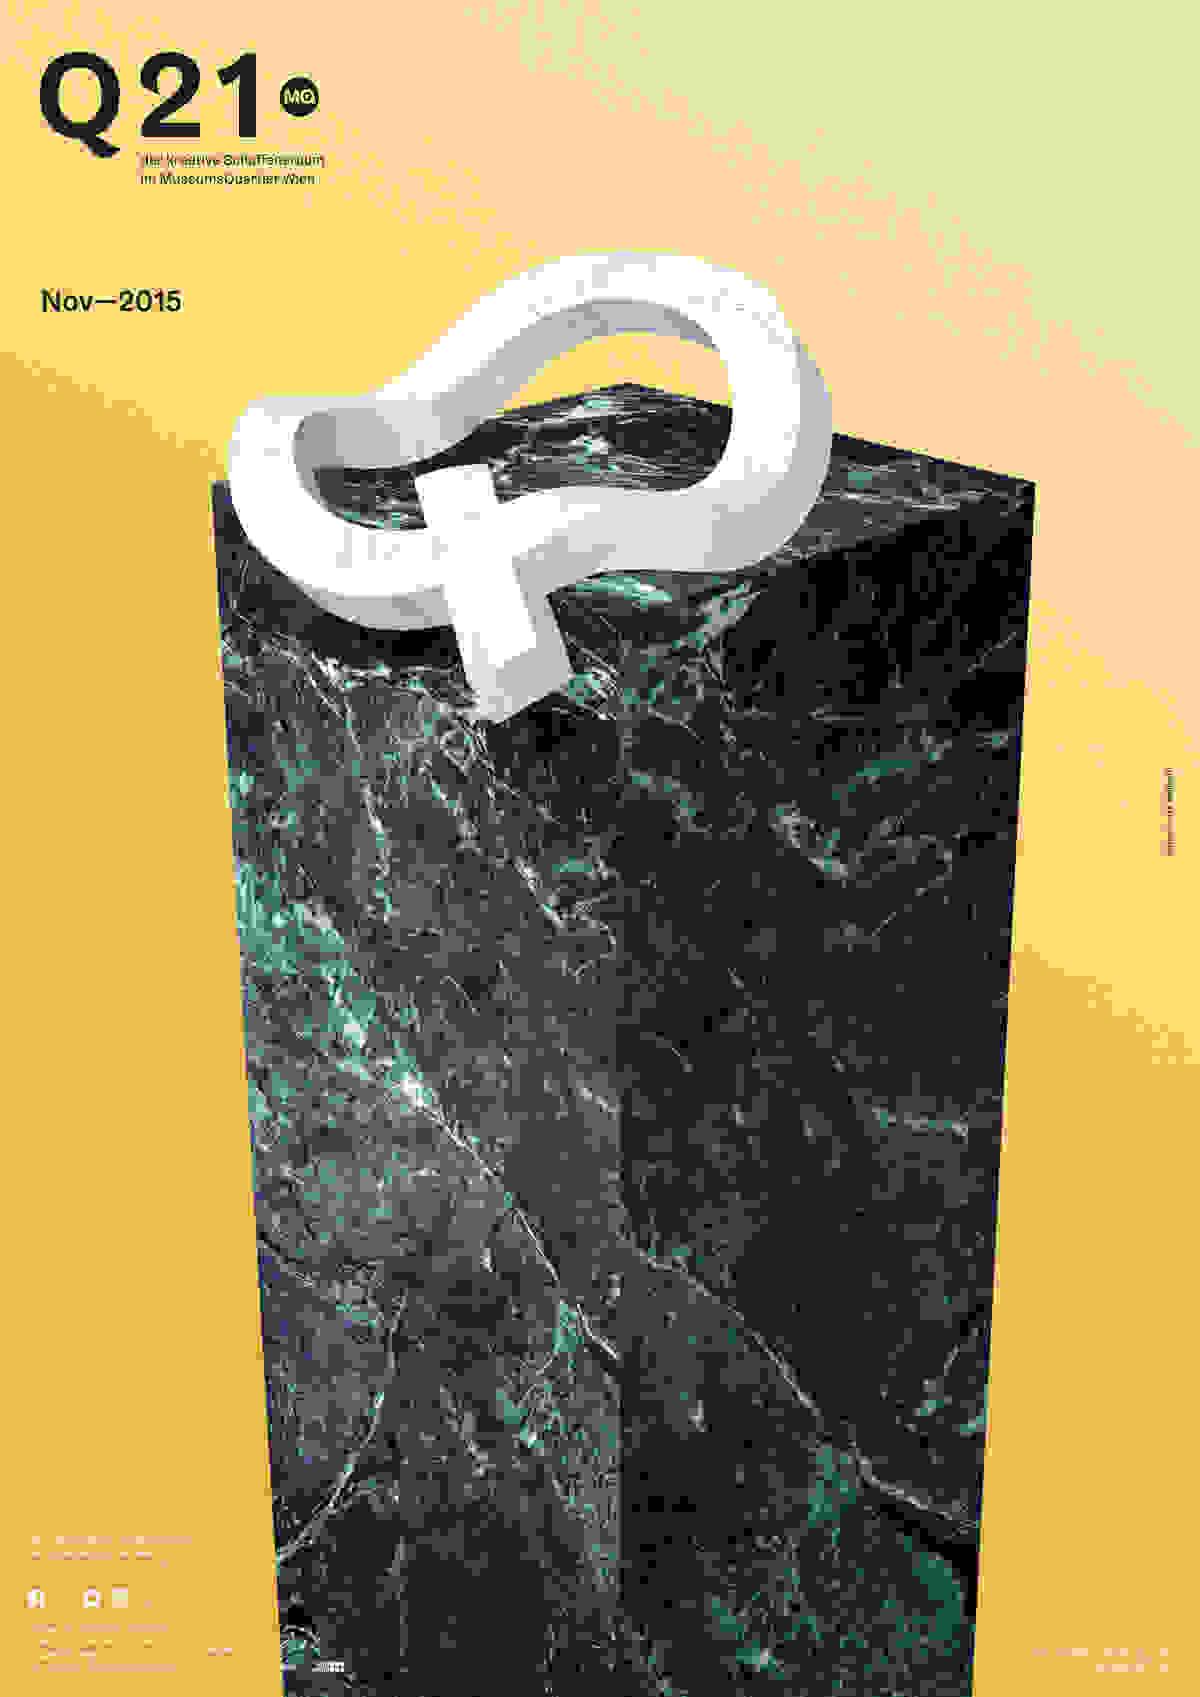 Q21 Plakat 2015 NOV 1200px